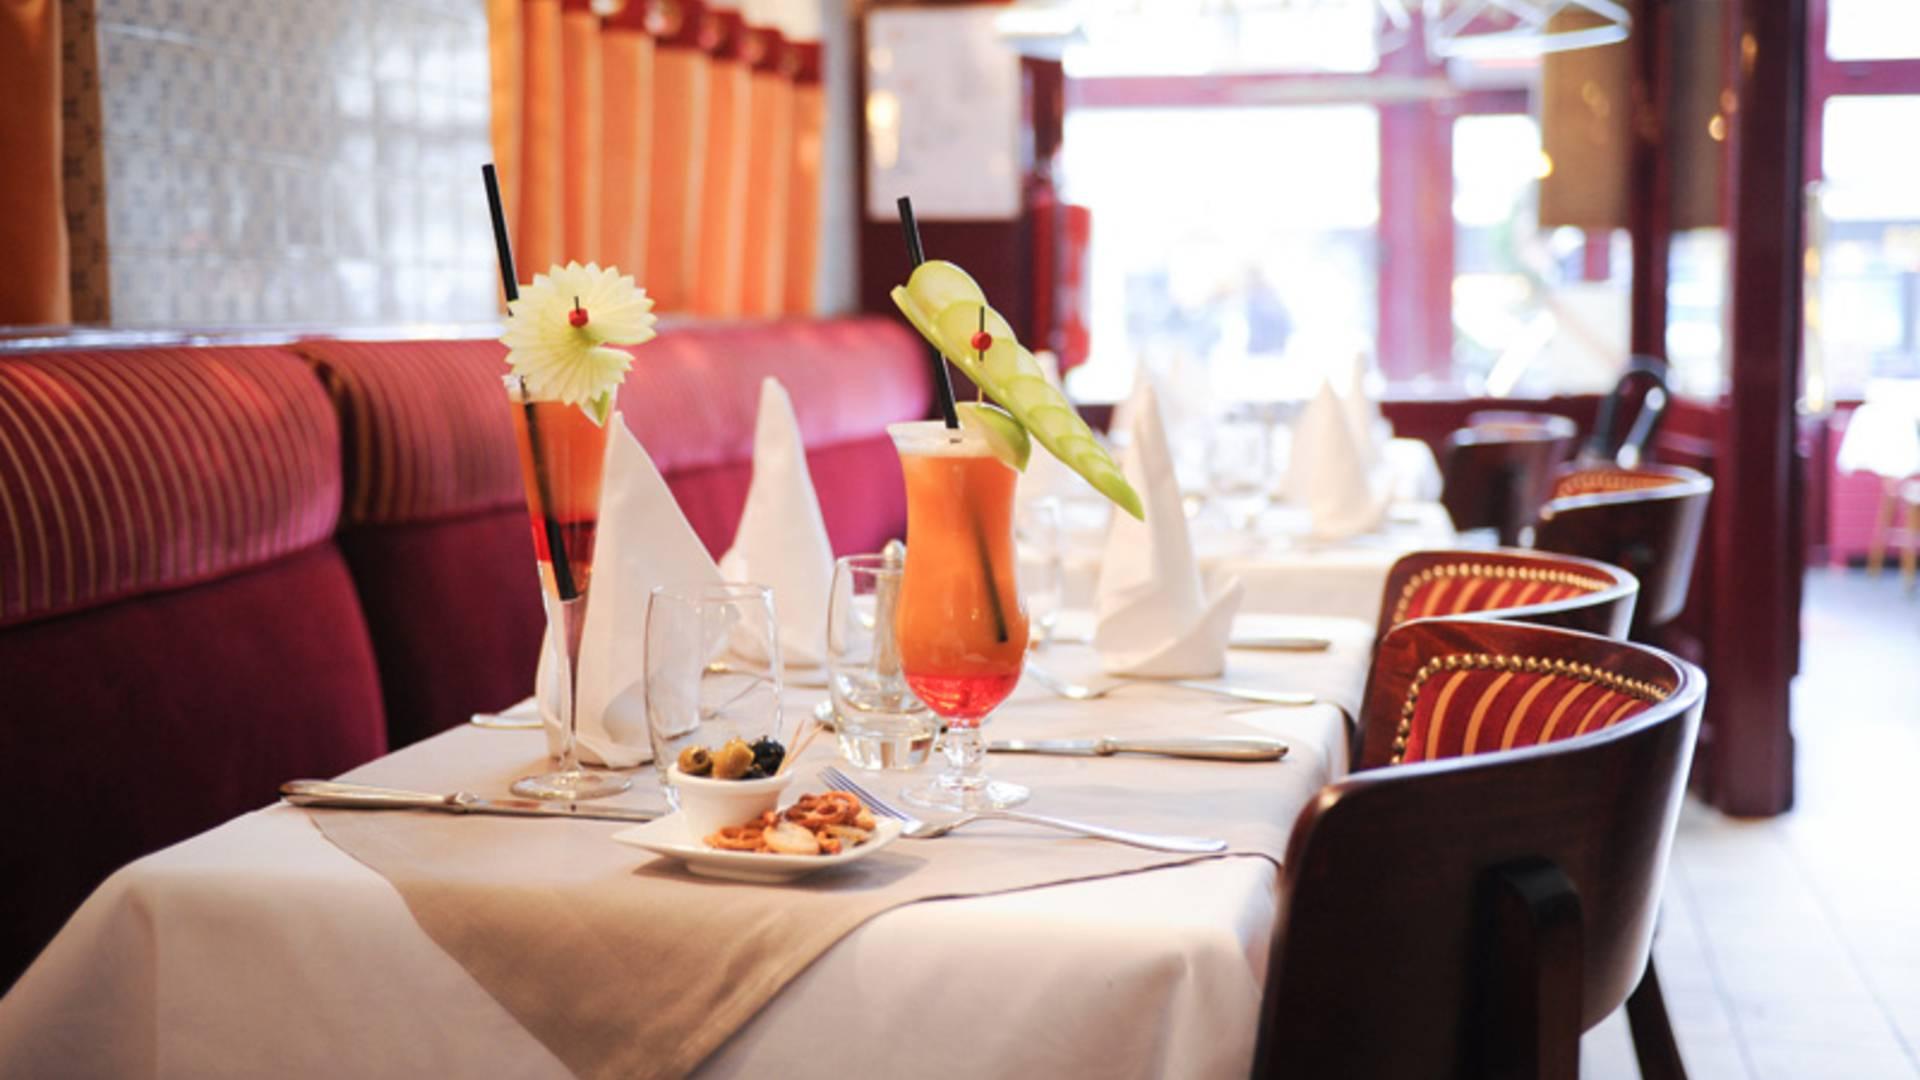 Valenciennes, restaurant l'Escargot, table dressée